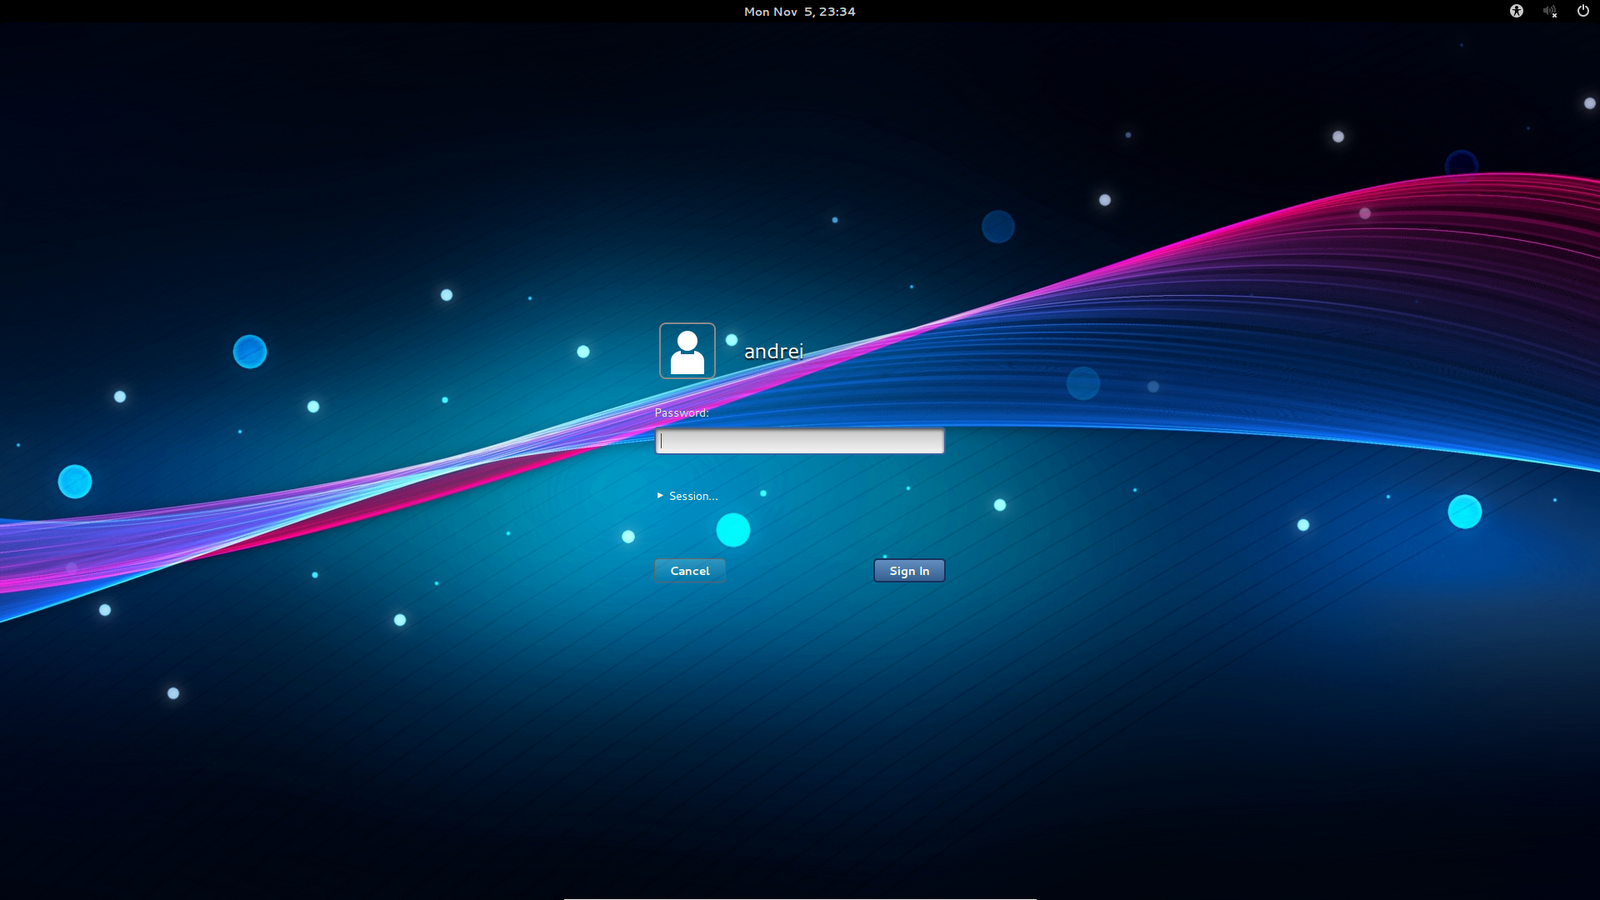 Lock Screen Change Theme Wallpaper Web Upd8 Ubuntu Linux blog 1600x900